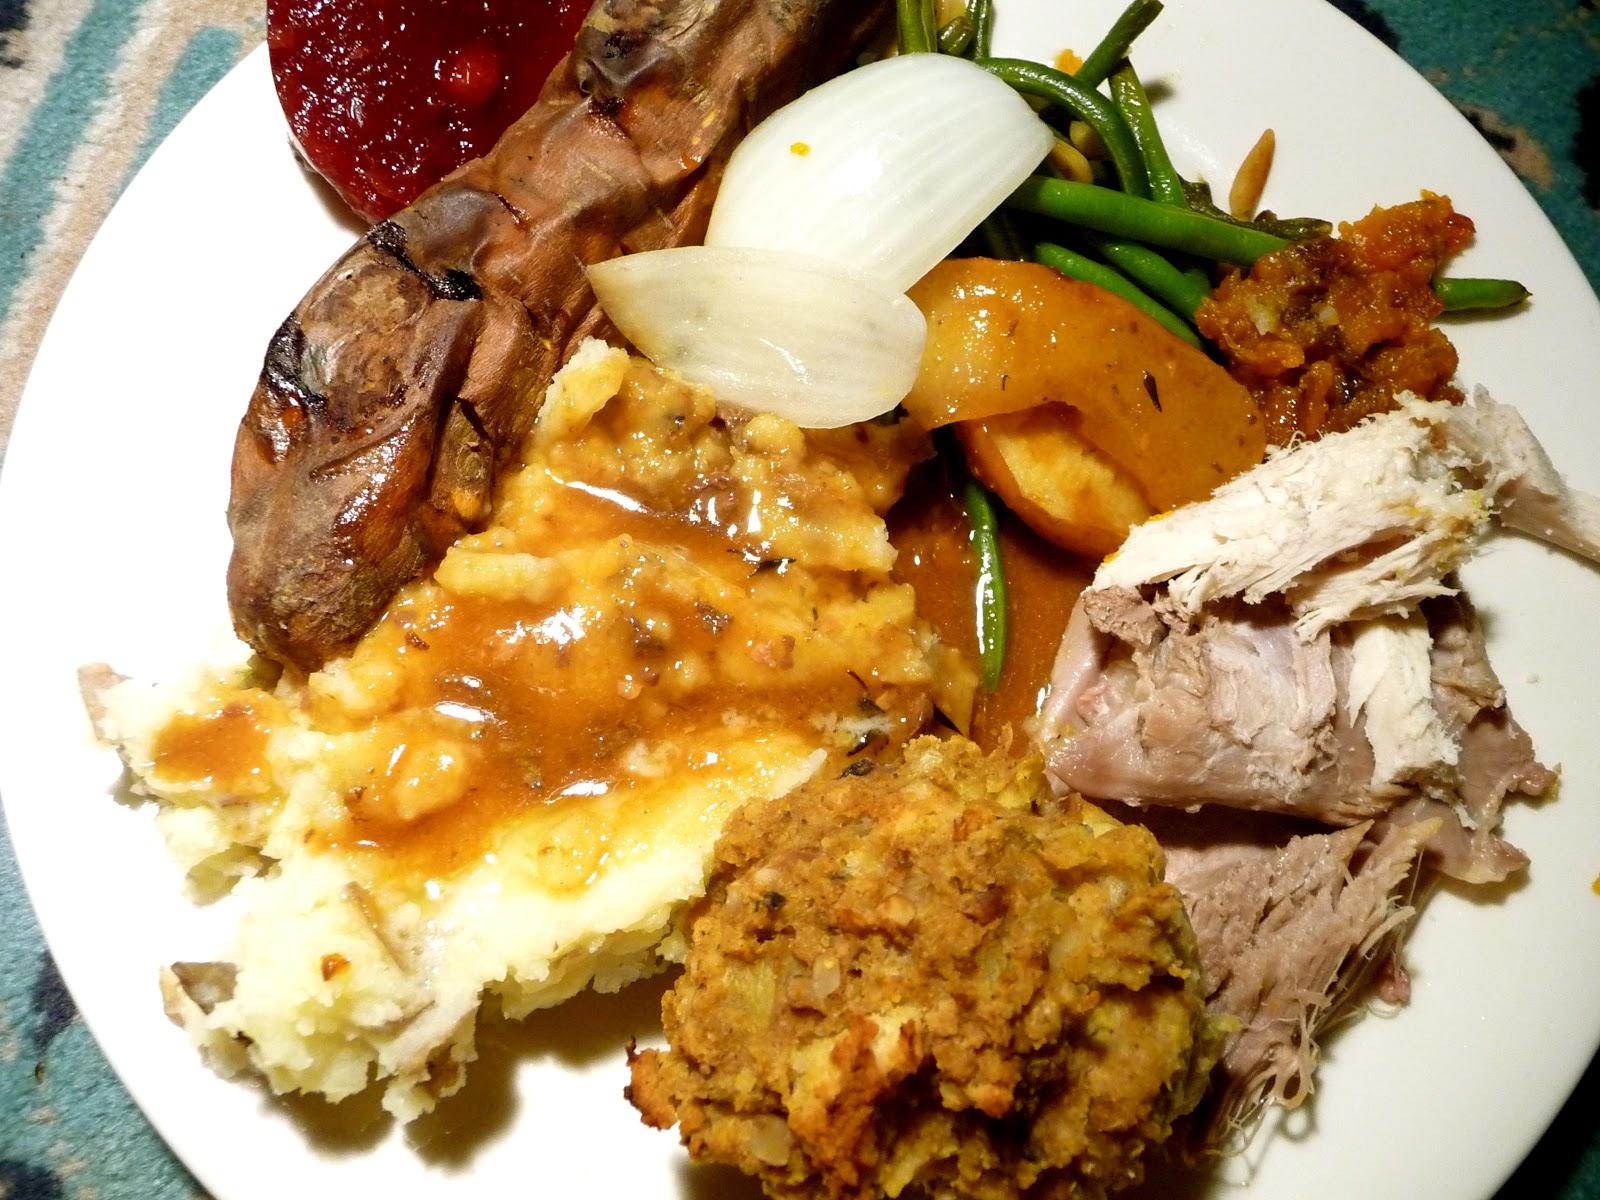 Thanksgiving turkey dinner recipes - photo#3